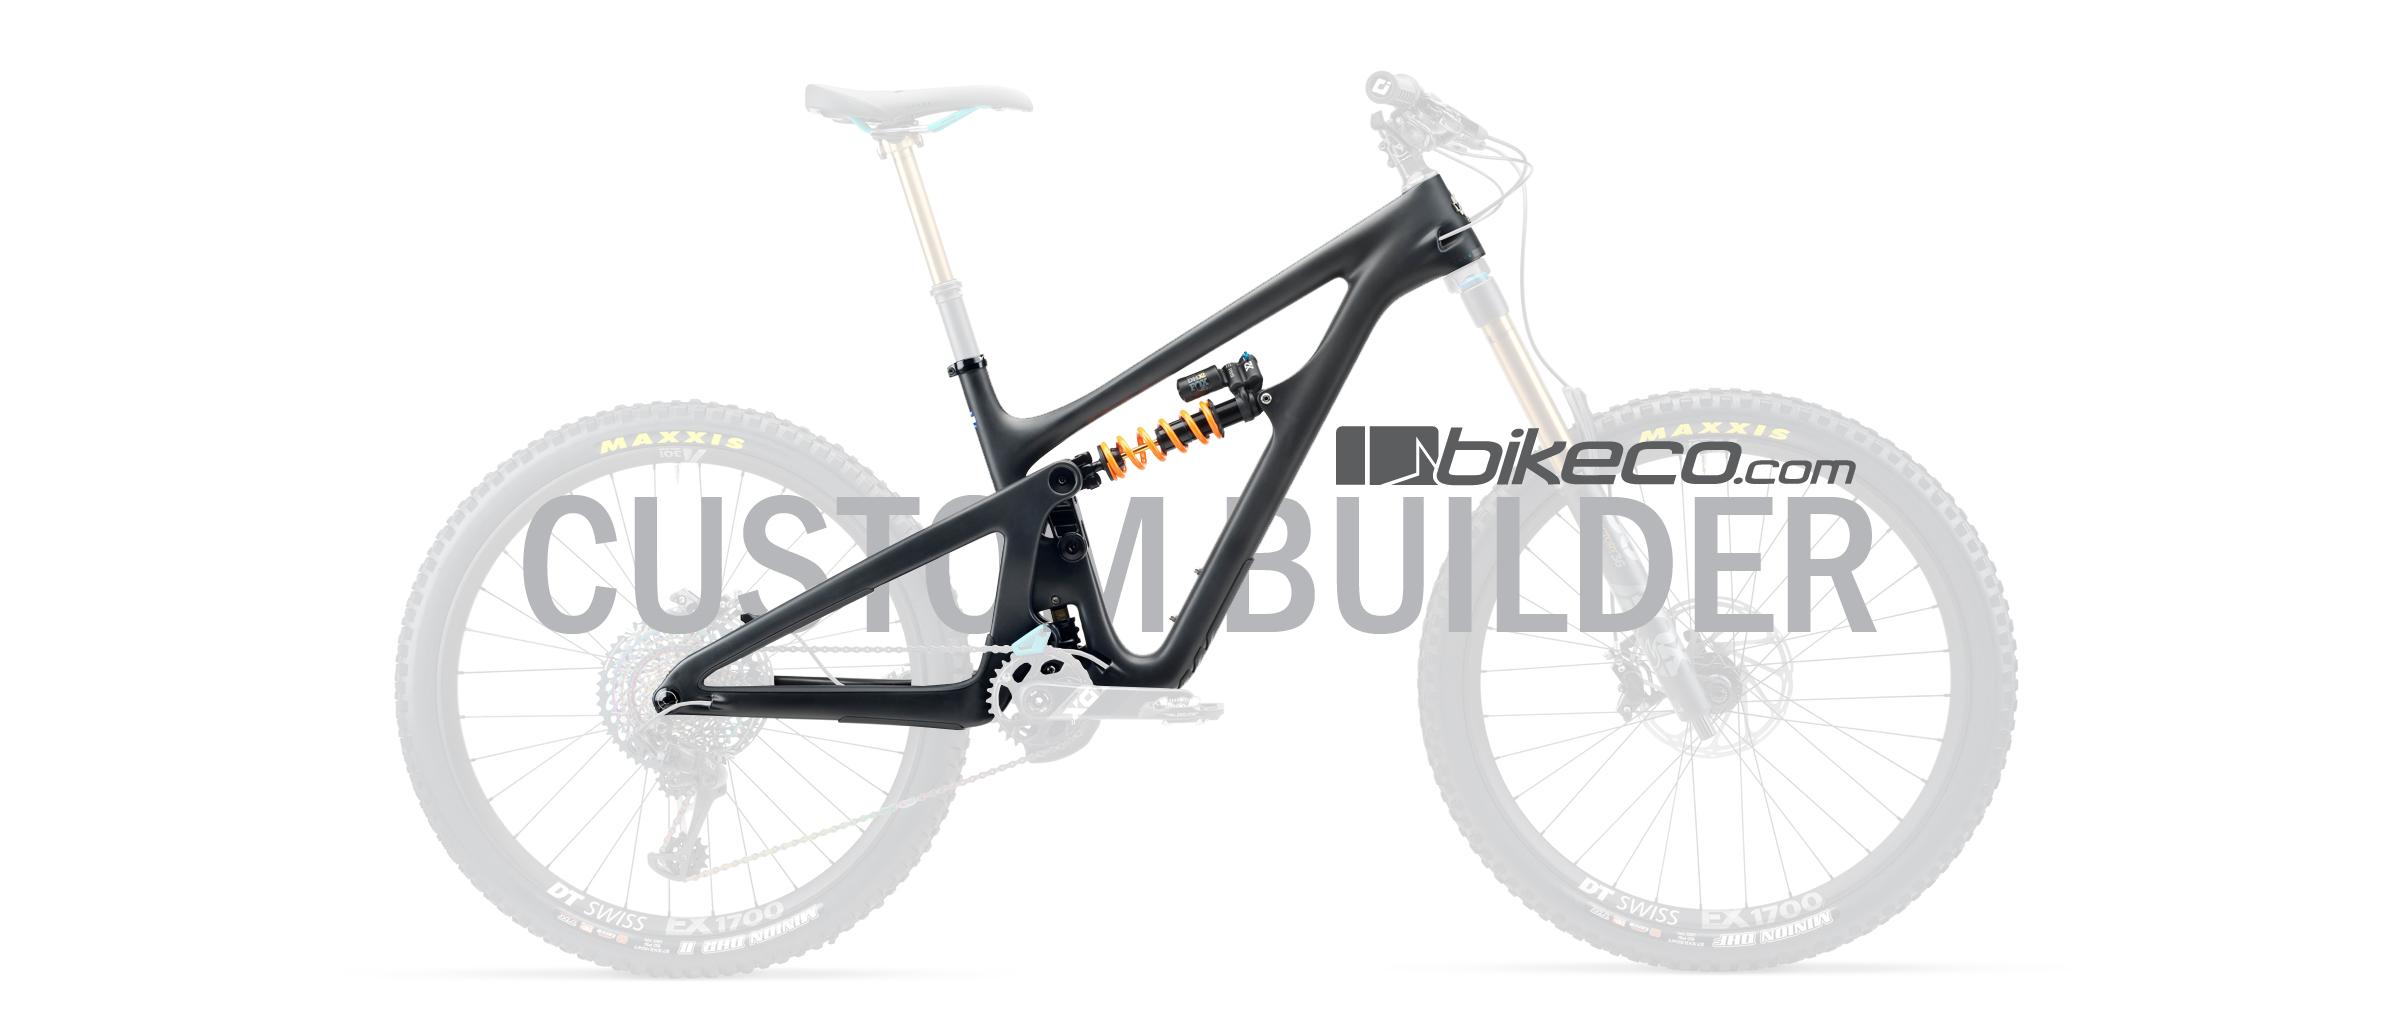 Yeti SB165 Custom Builder. Black frame with translucent components